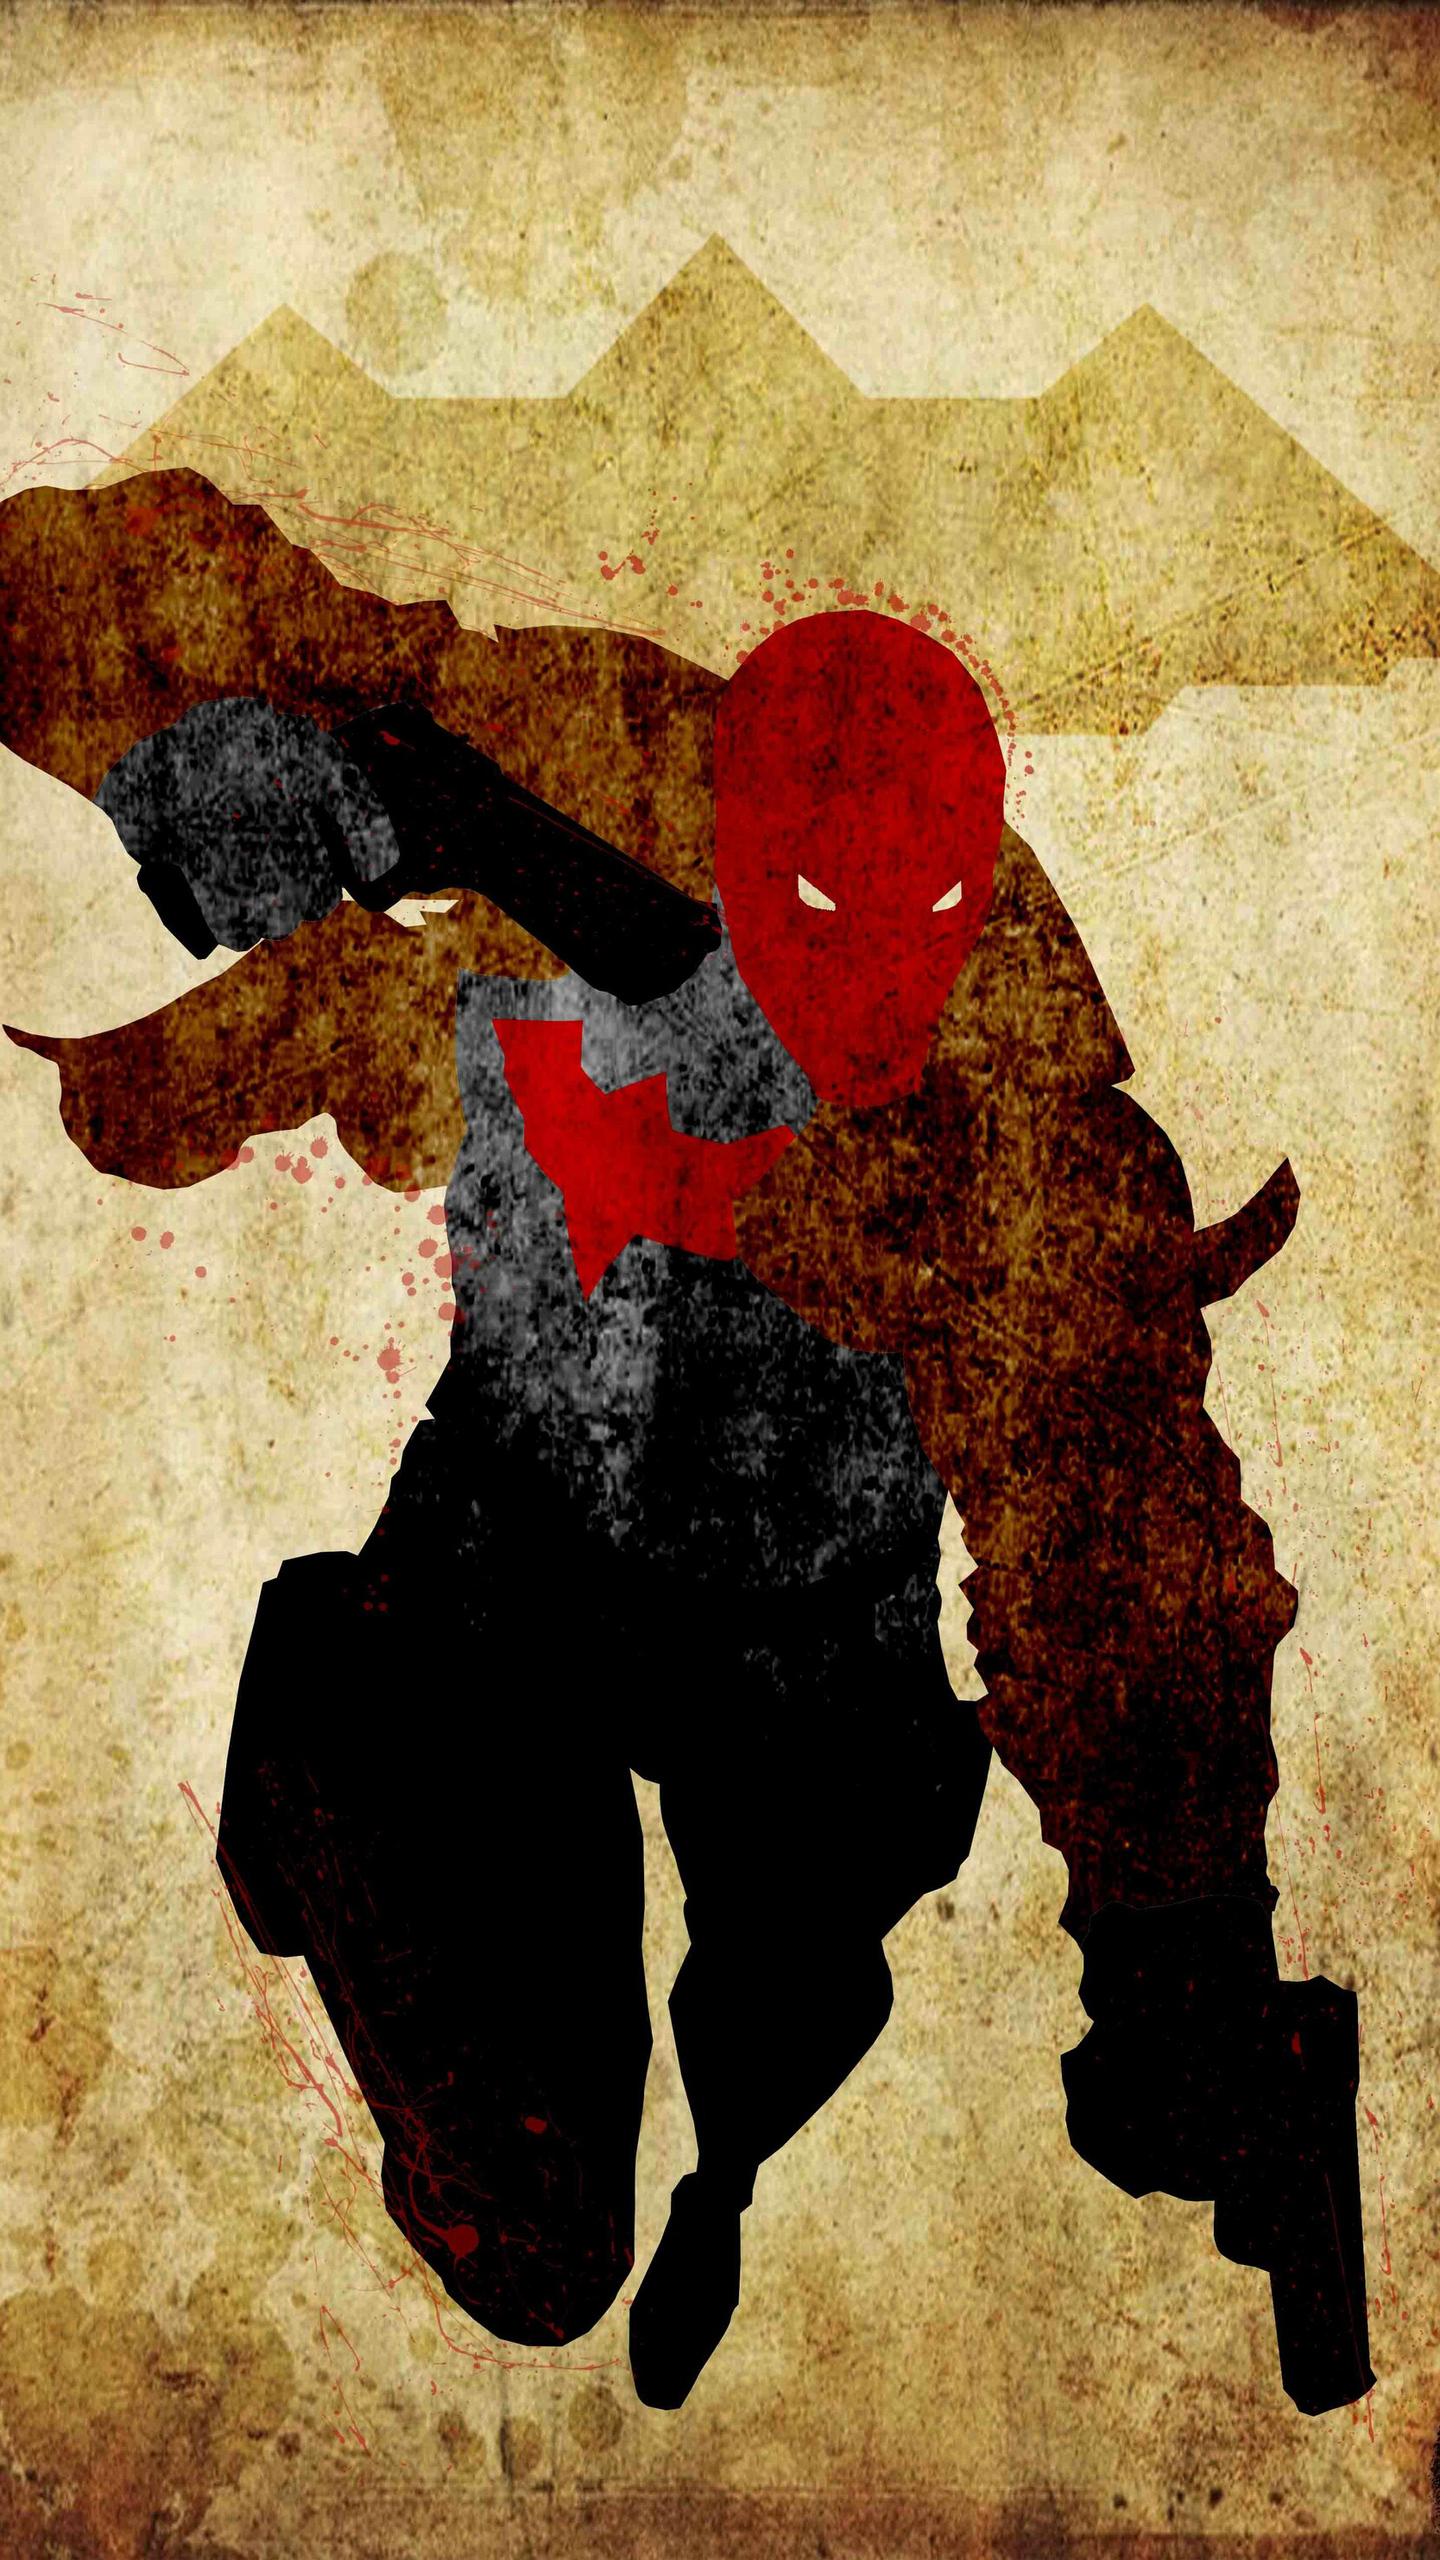 red-hood-newart-0u.jpg